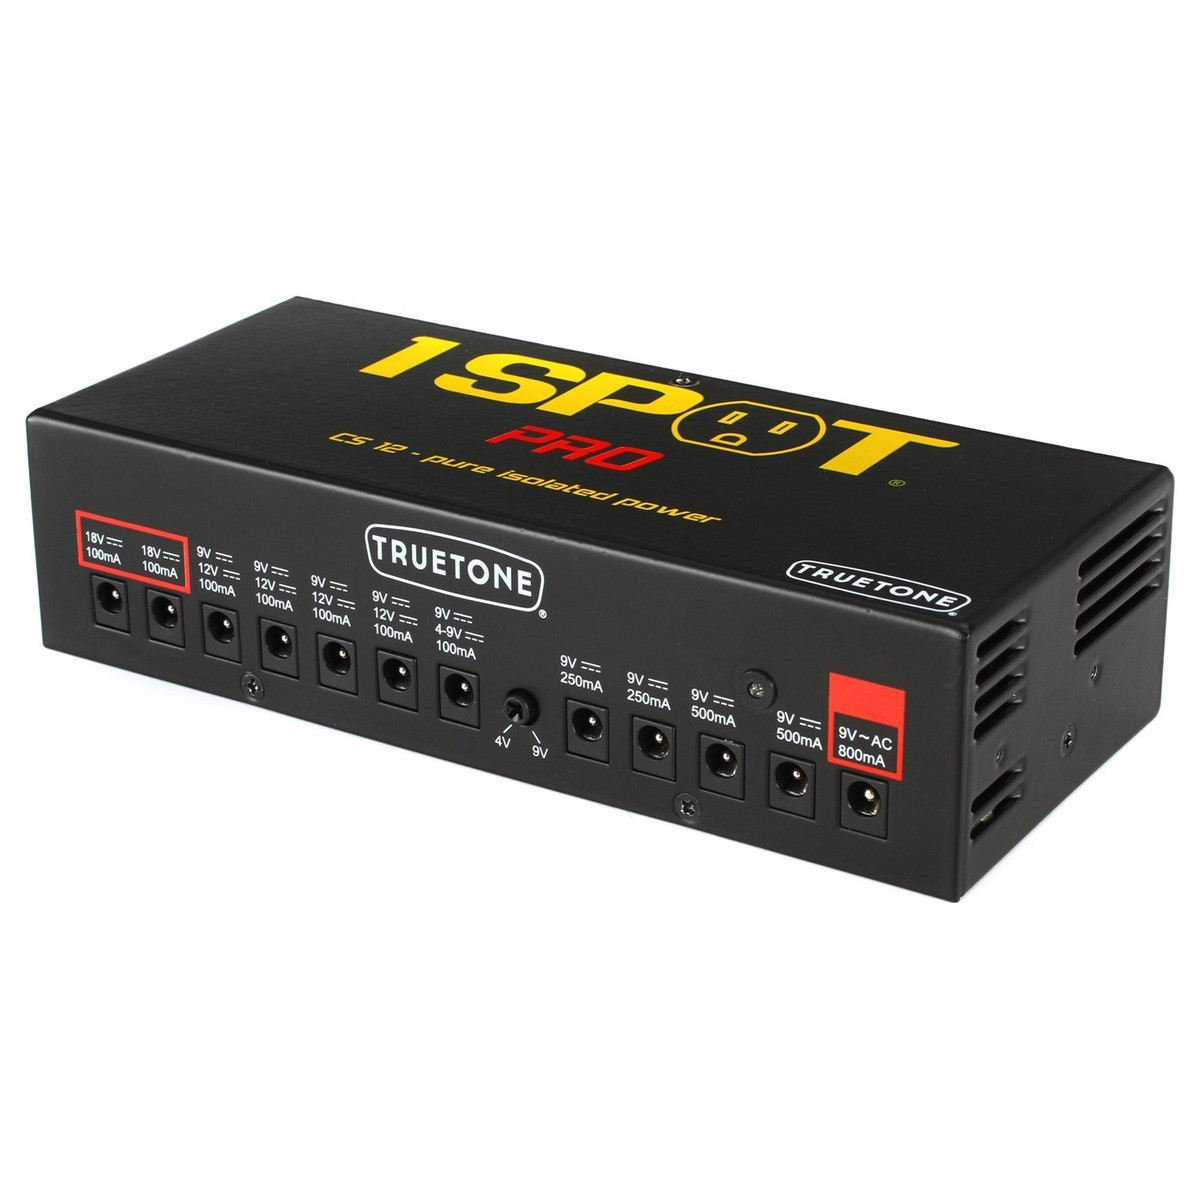 truetone 1 spot pro cs12 guitar pedal multi power supply at gear4music. Black Bedroom Furniture Sets. Home Design Ideas